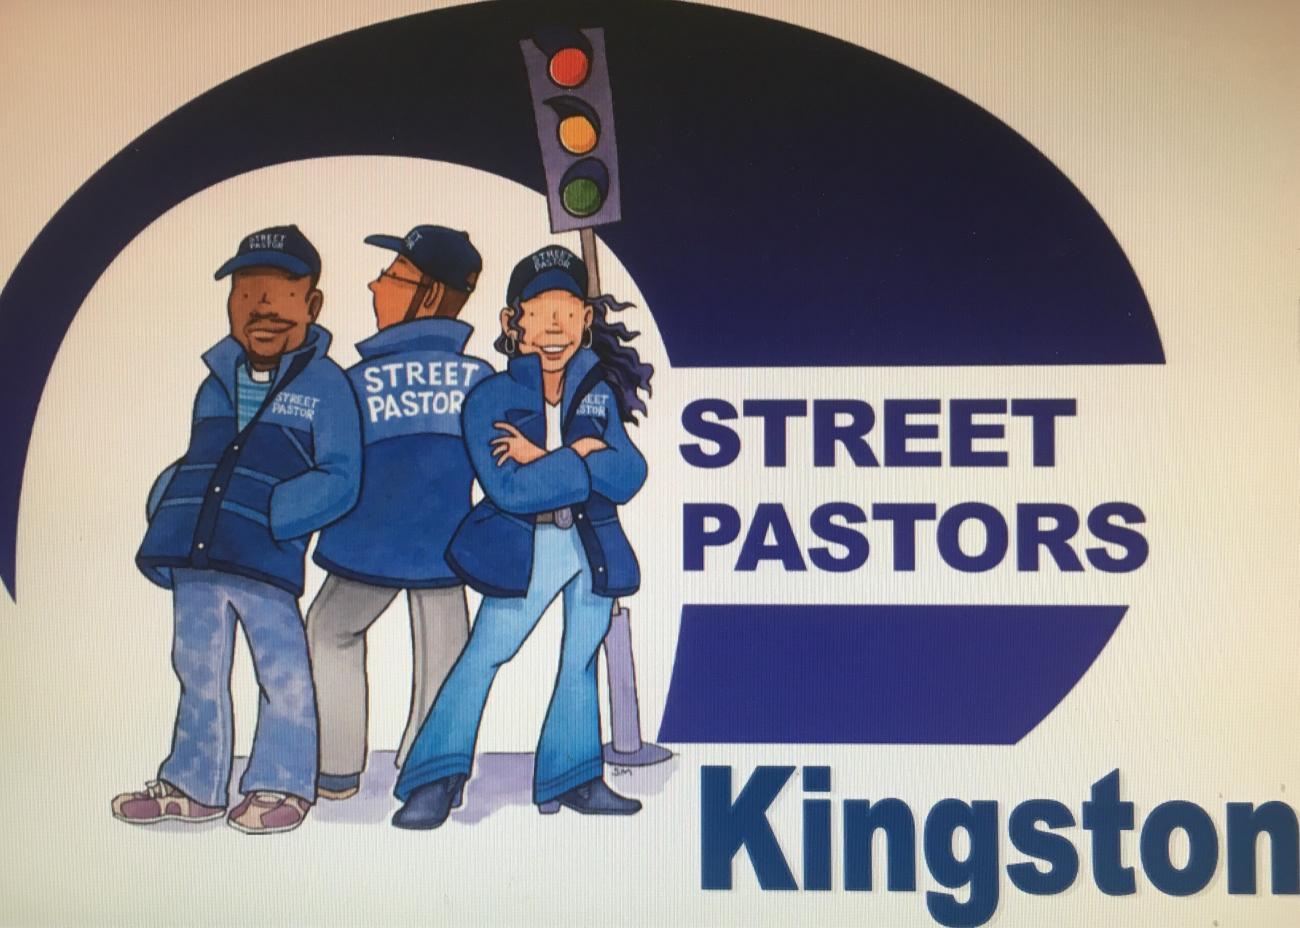 10.30am - Street Pastors Image